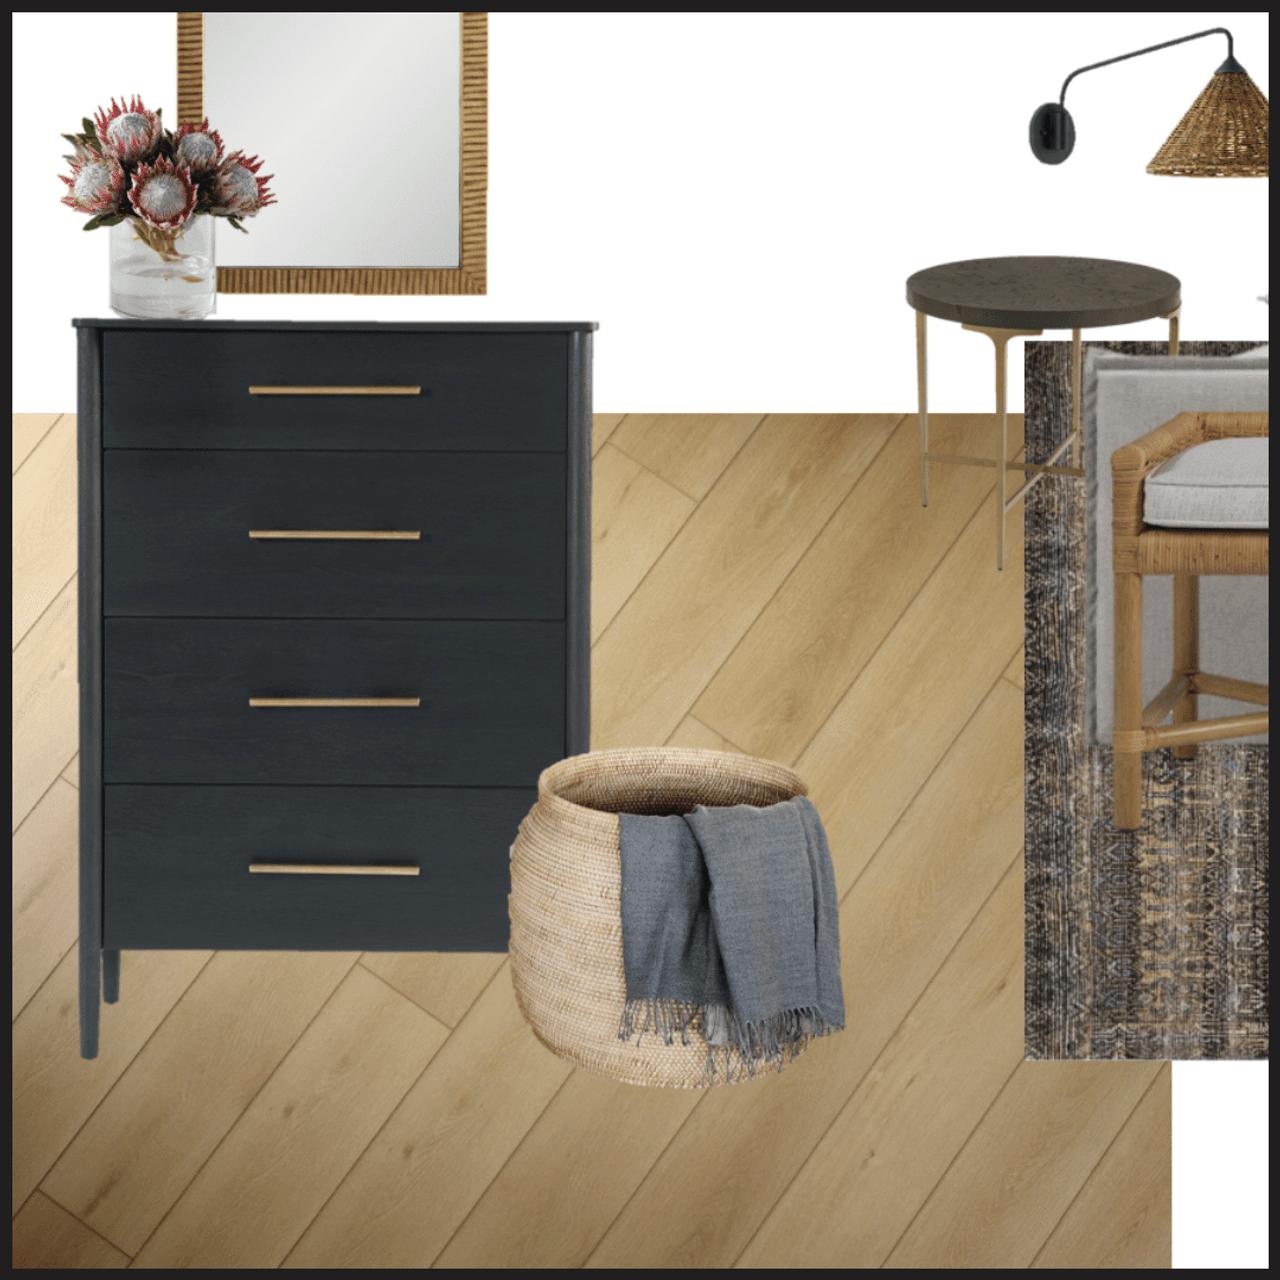 Styling Light Wood Floors for a Coastal Inspired Bedroom   Mood Board